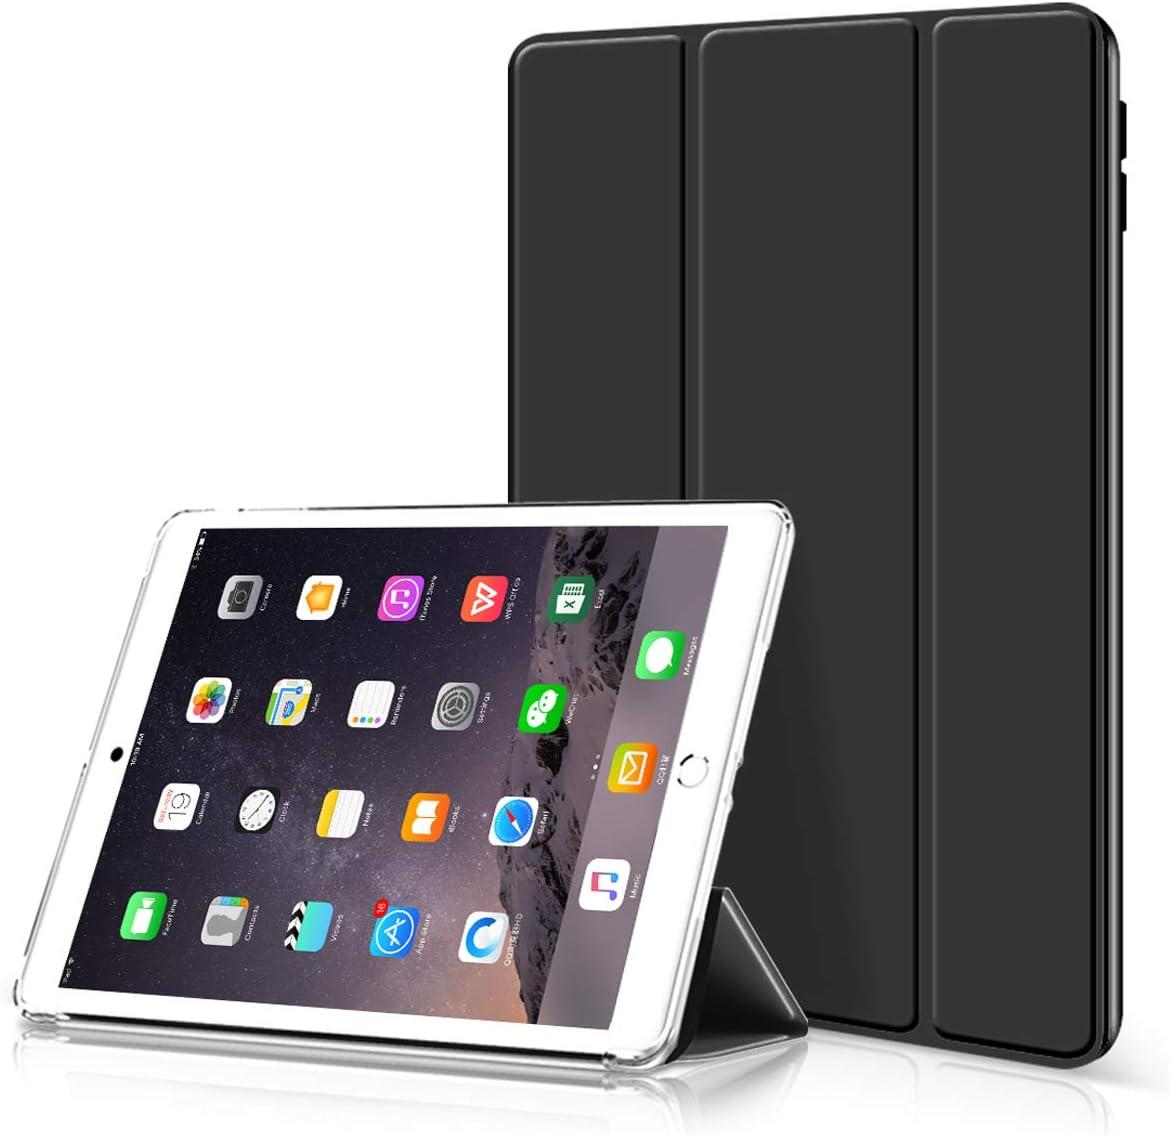 KenKe iPad Ranking TOP1 9.7 Inch Case 2017 6th Superlatite 2018 iP Generation